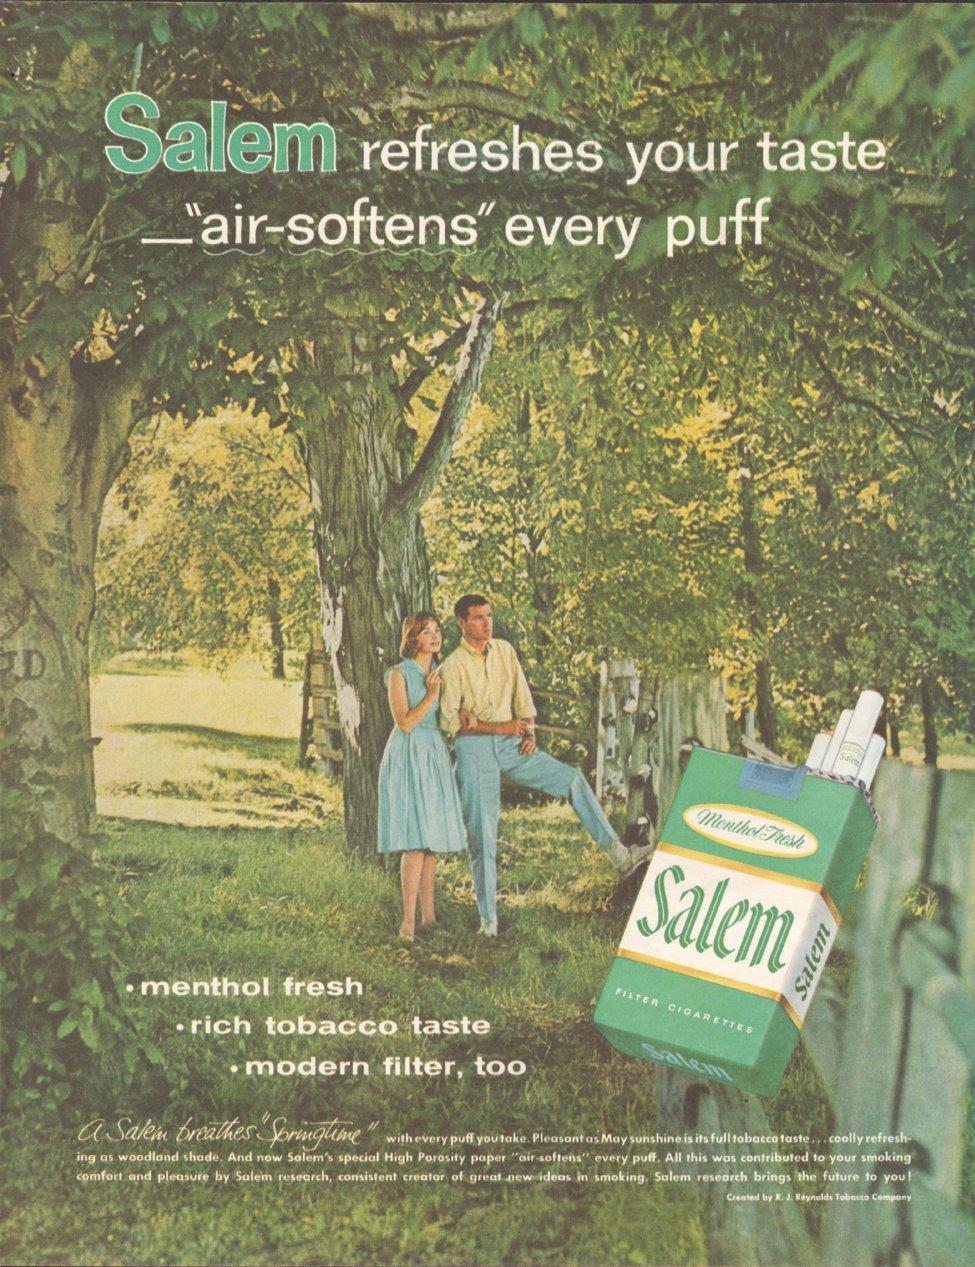 SALEM CIGARETTES SATURDAY EVENING POST 06/11/1960 p. 54